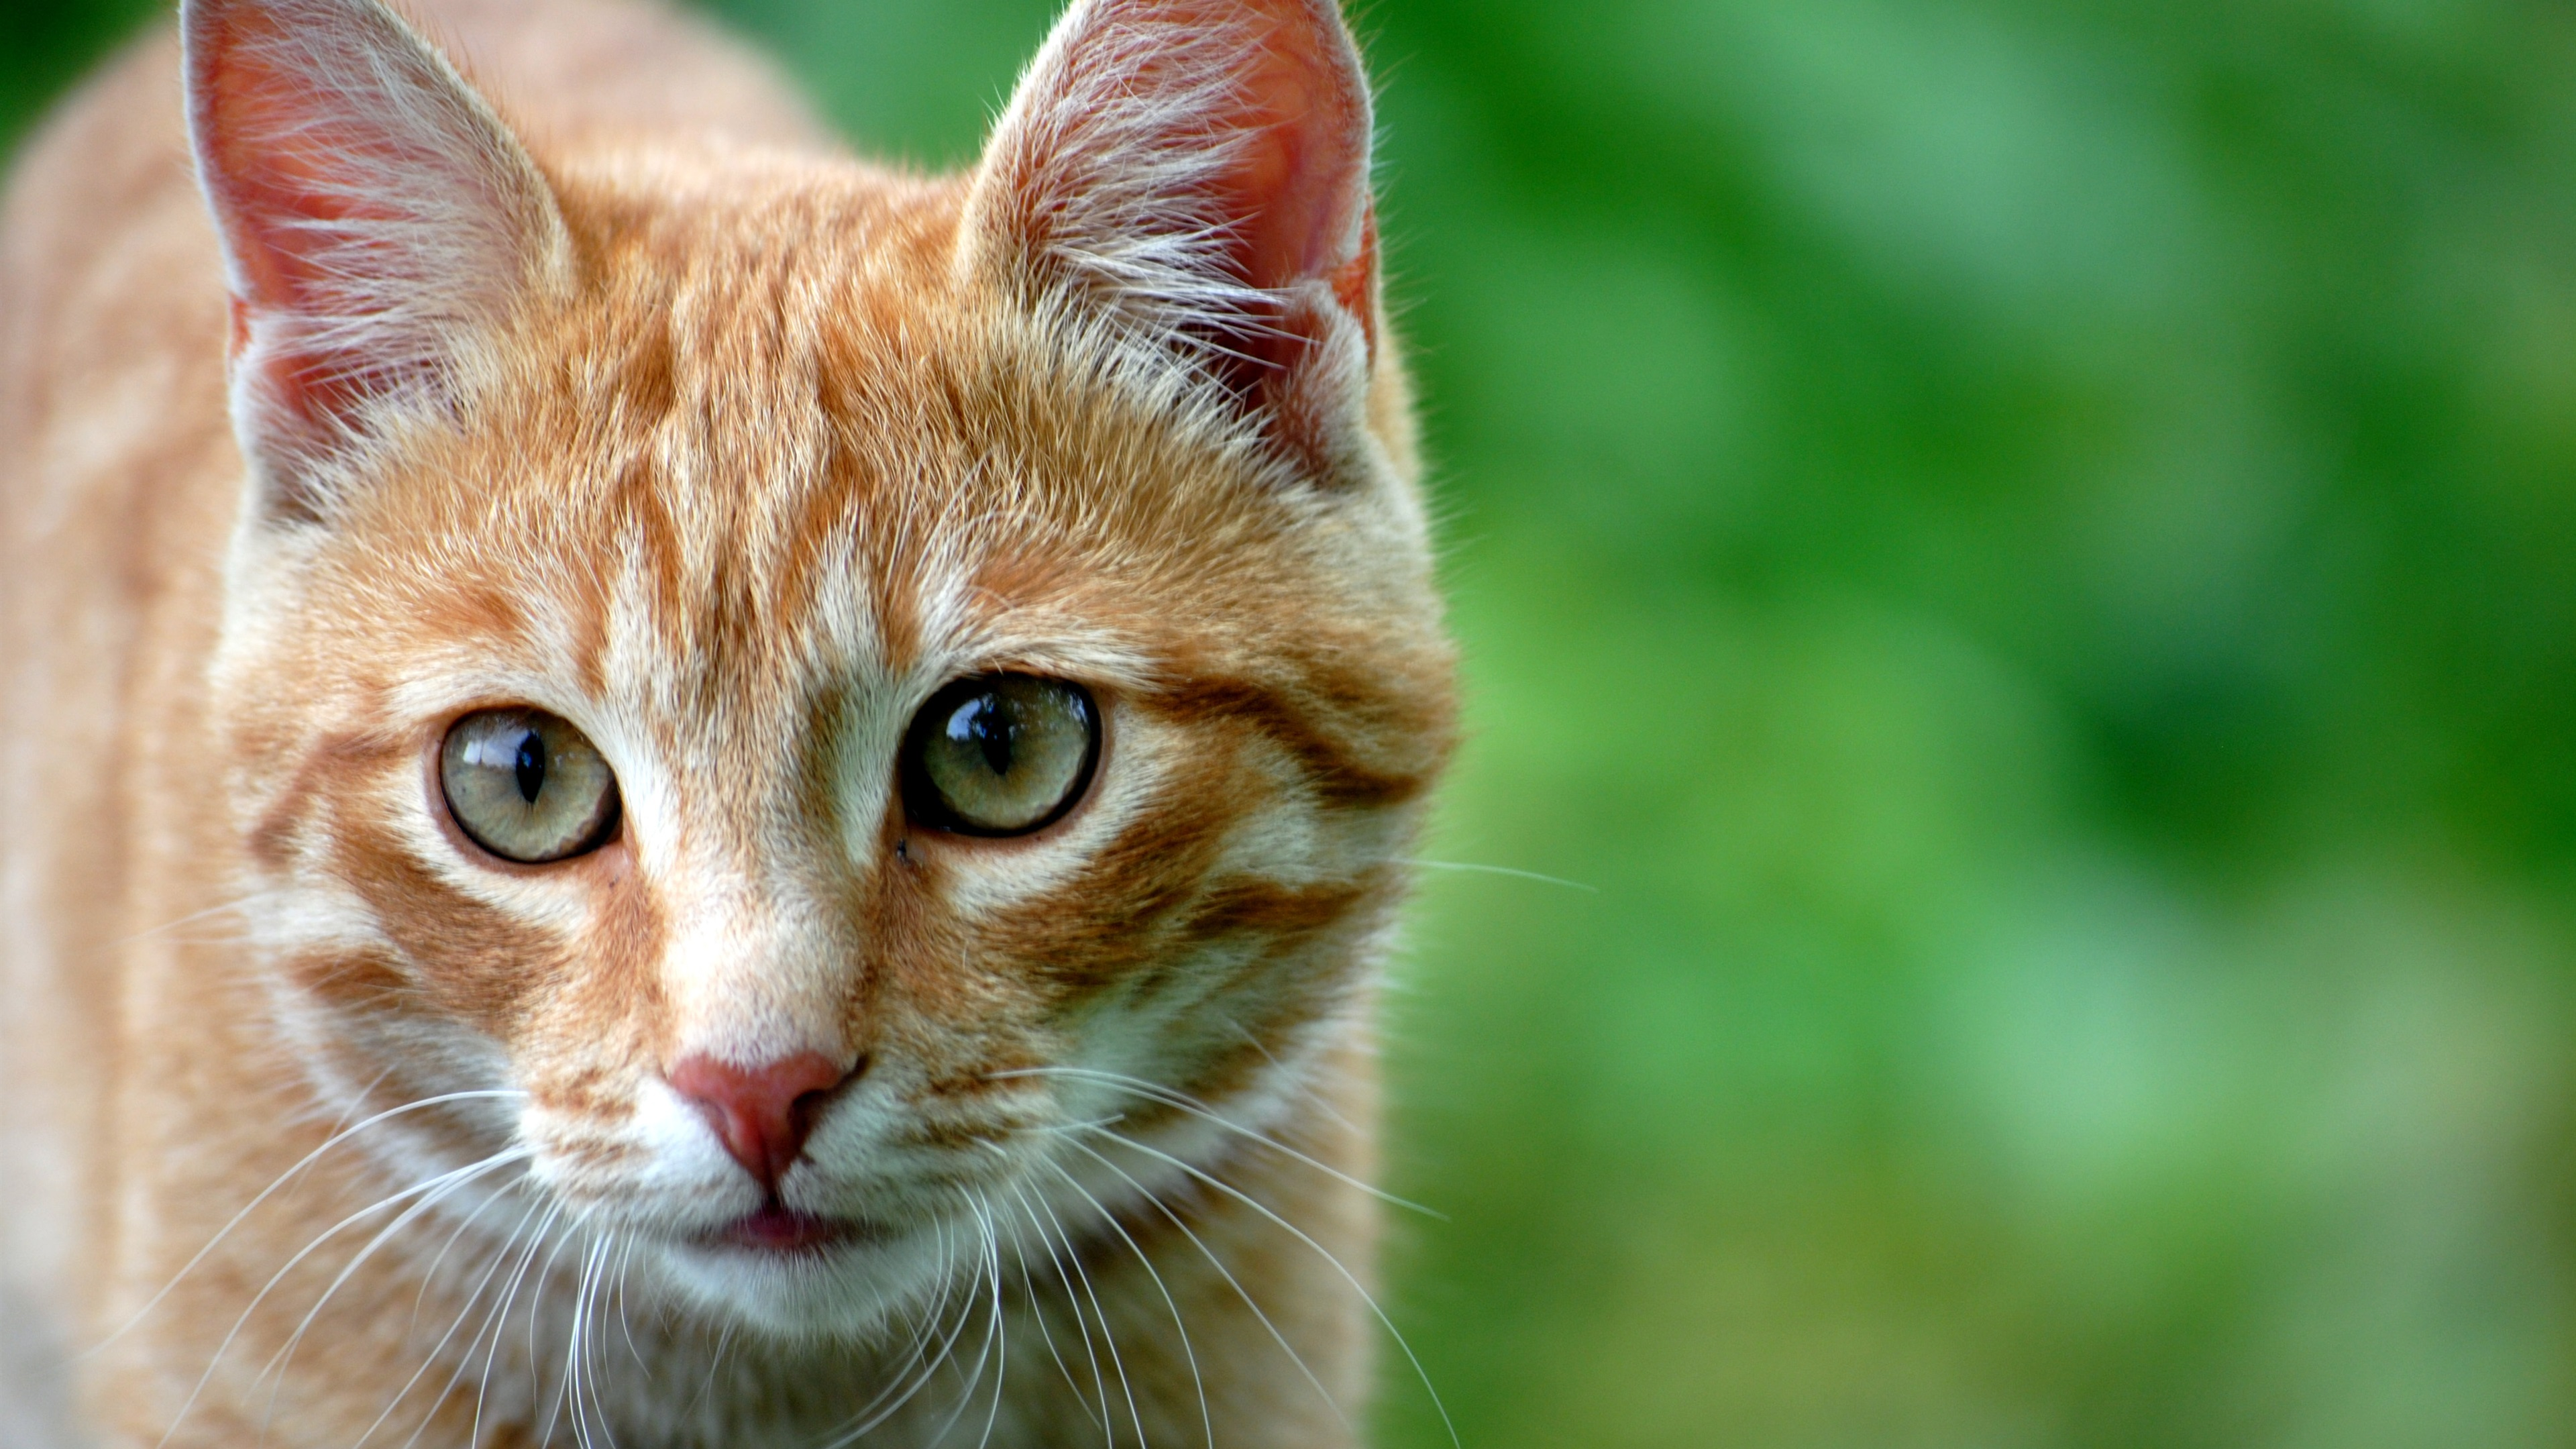 Fondos de pantalla Gato naranja vista frontal, fondo verde 3840x2160 UHD 4K Imagen